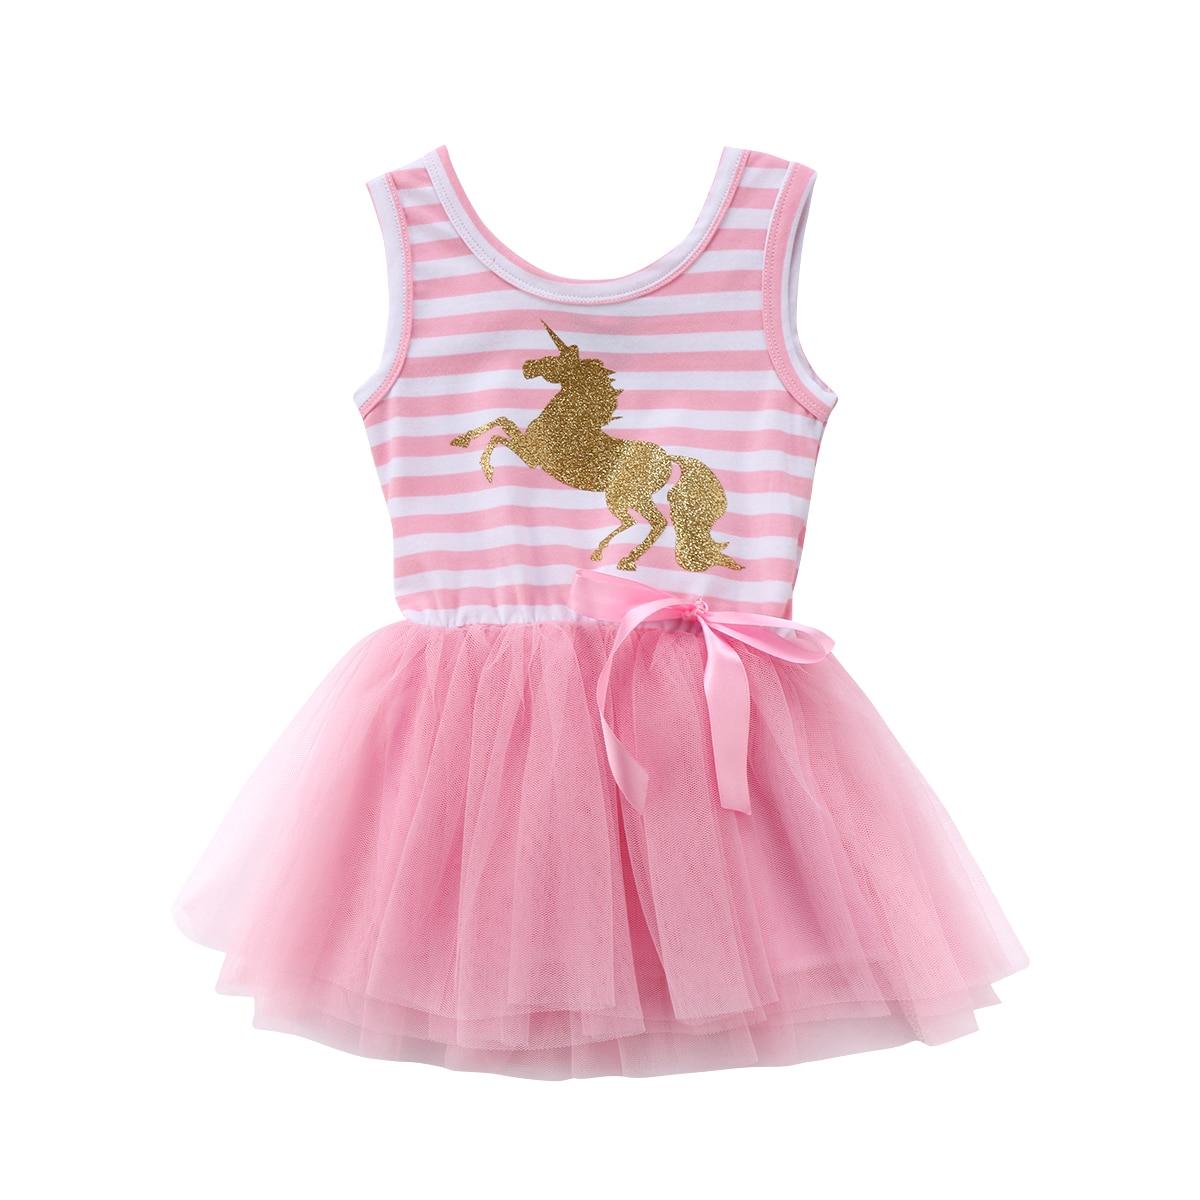 2018 Pretty Little Girl Baby Unicorn Dress Summer Sleeveless Striped Pink Mesh Tulle Party Wedding Tutu Summer Dress